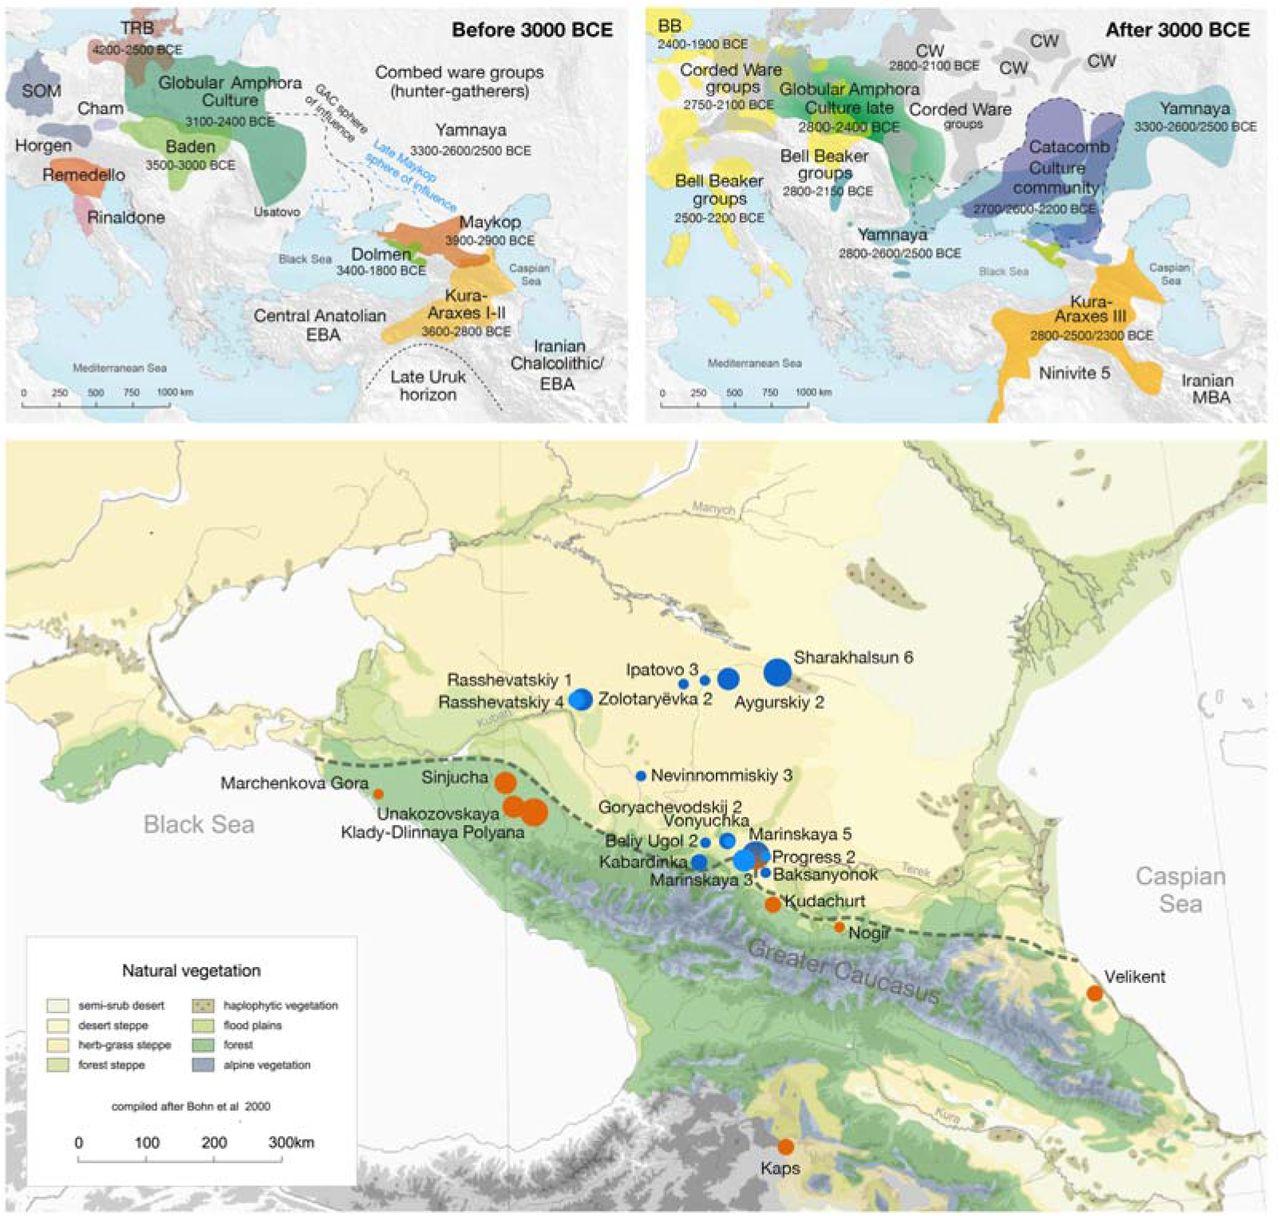 The genetic prehistory of the Greater Caucasus | bioRxiv